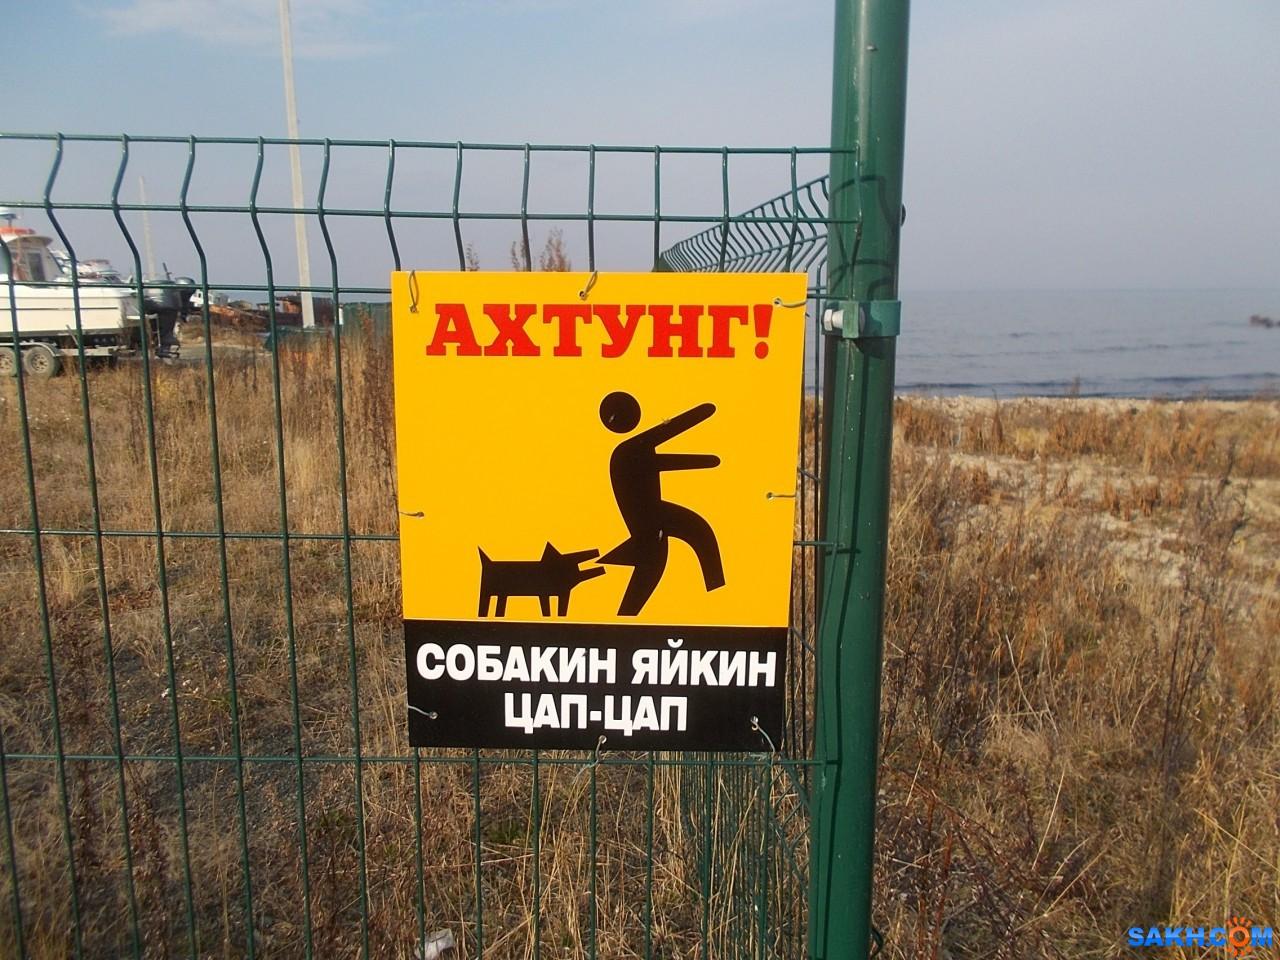 Valery: На заборе яхт-клуба в 1-ой Пади